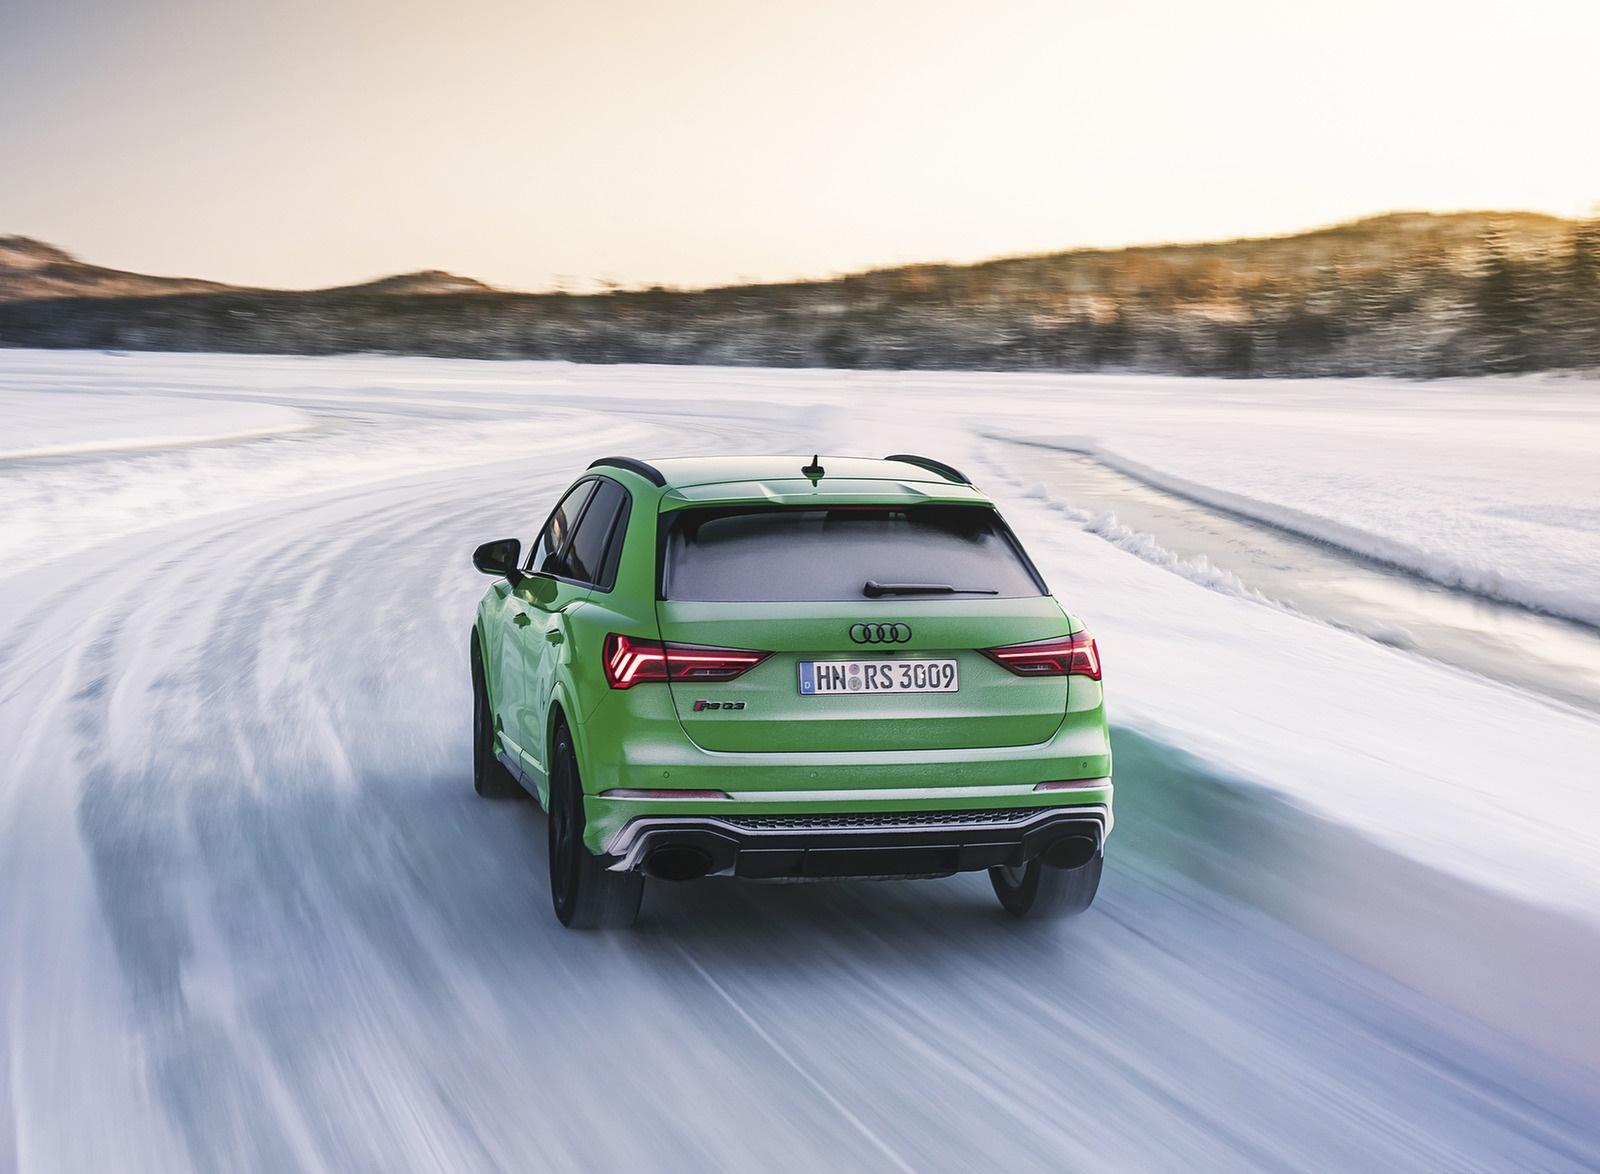 2020 Audi RS Q3 (Color: Kyalami Green) Rear Wallpapers #31 of 116